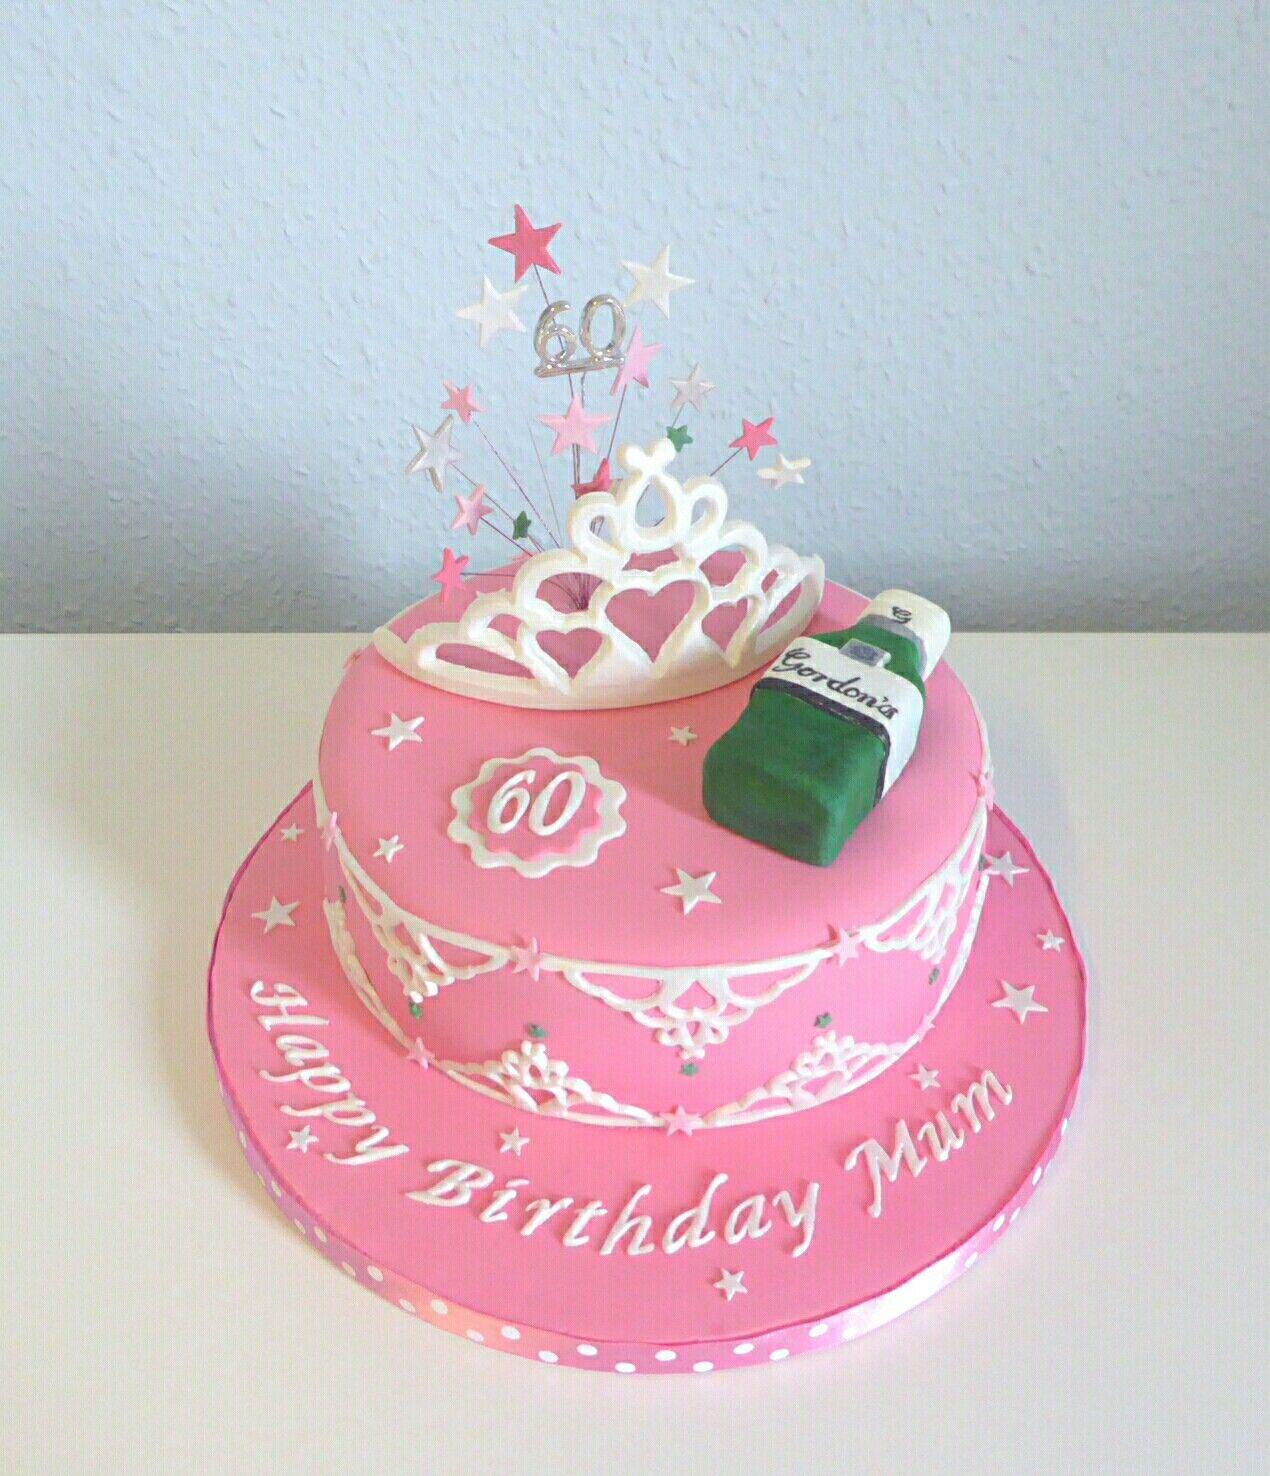 Pub Landlord Themed 40th Birthday Cake Pub Landlord Cake In